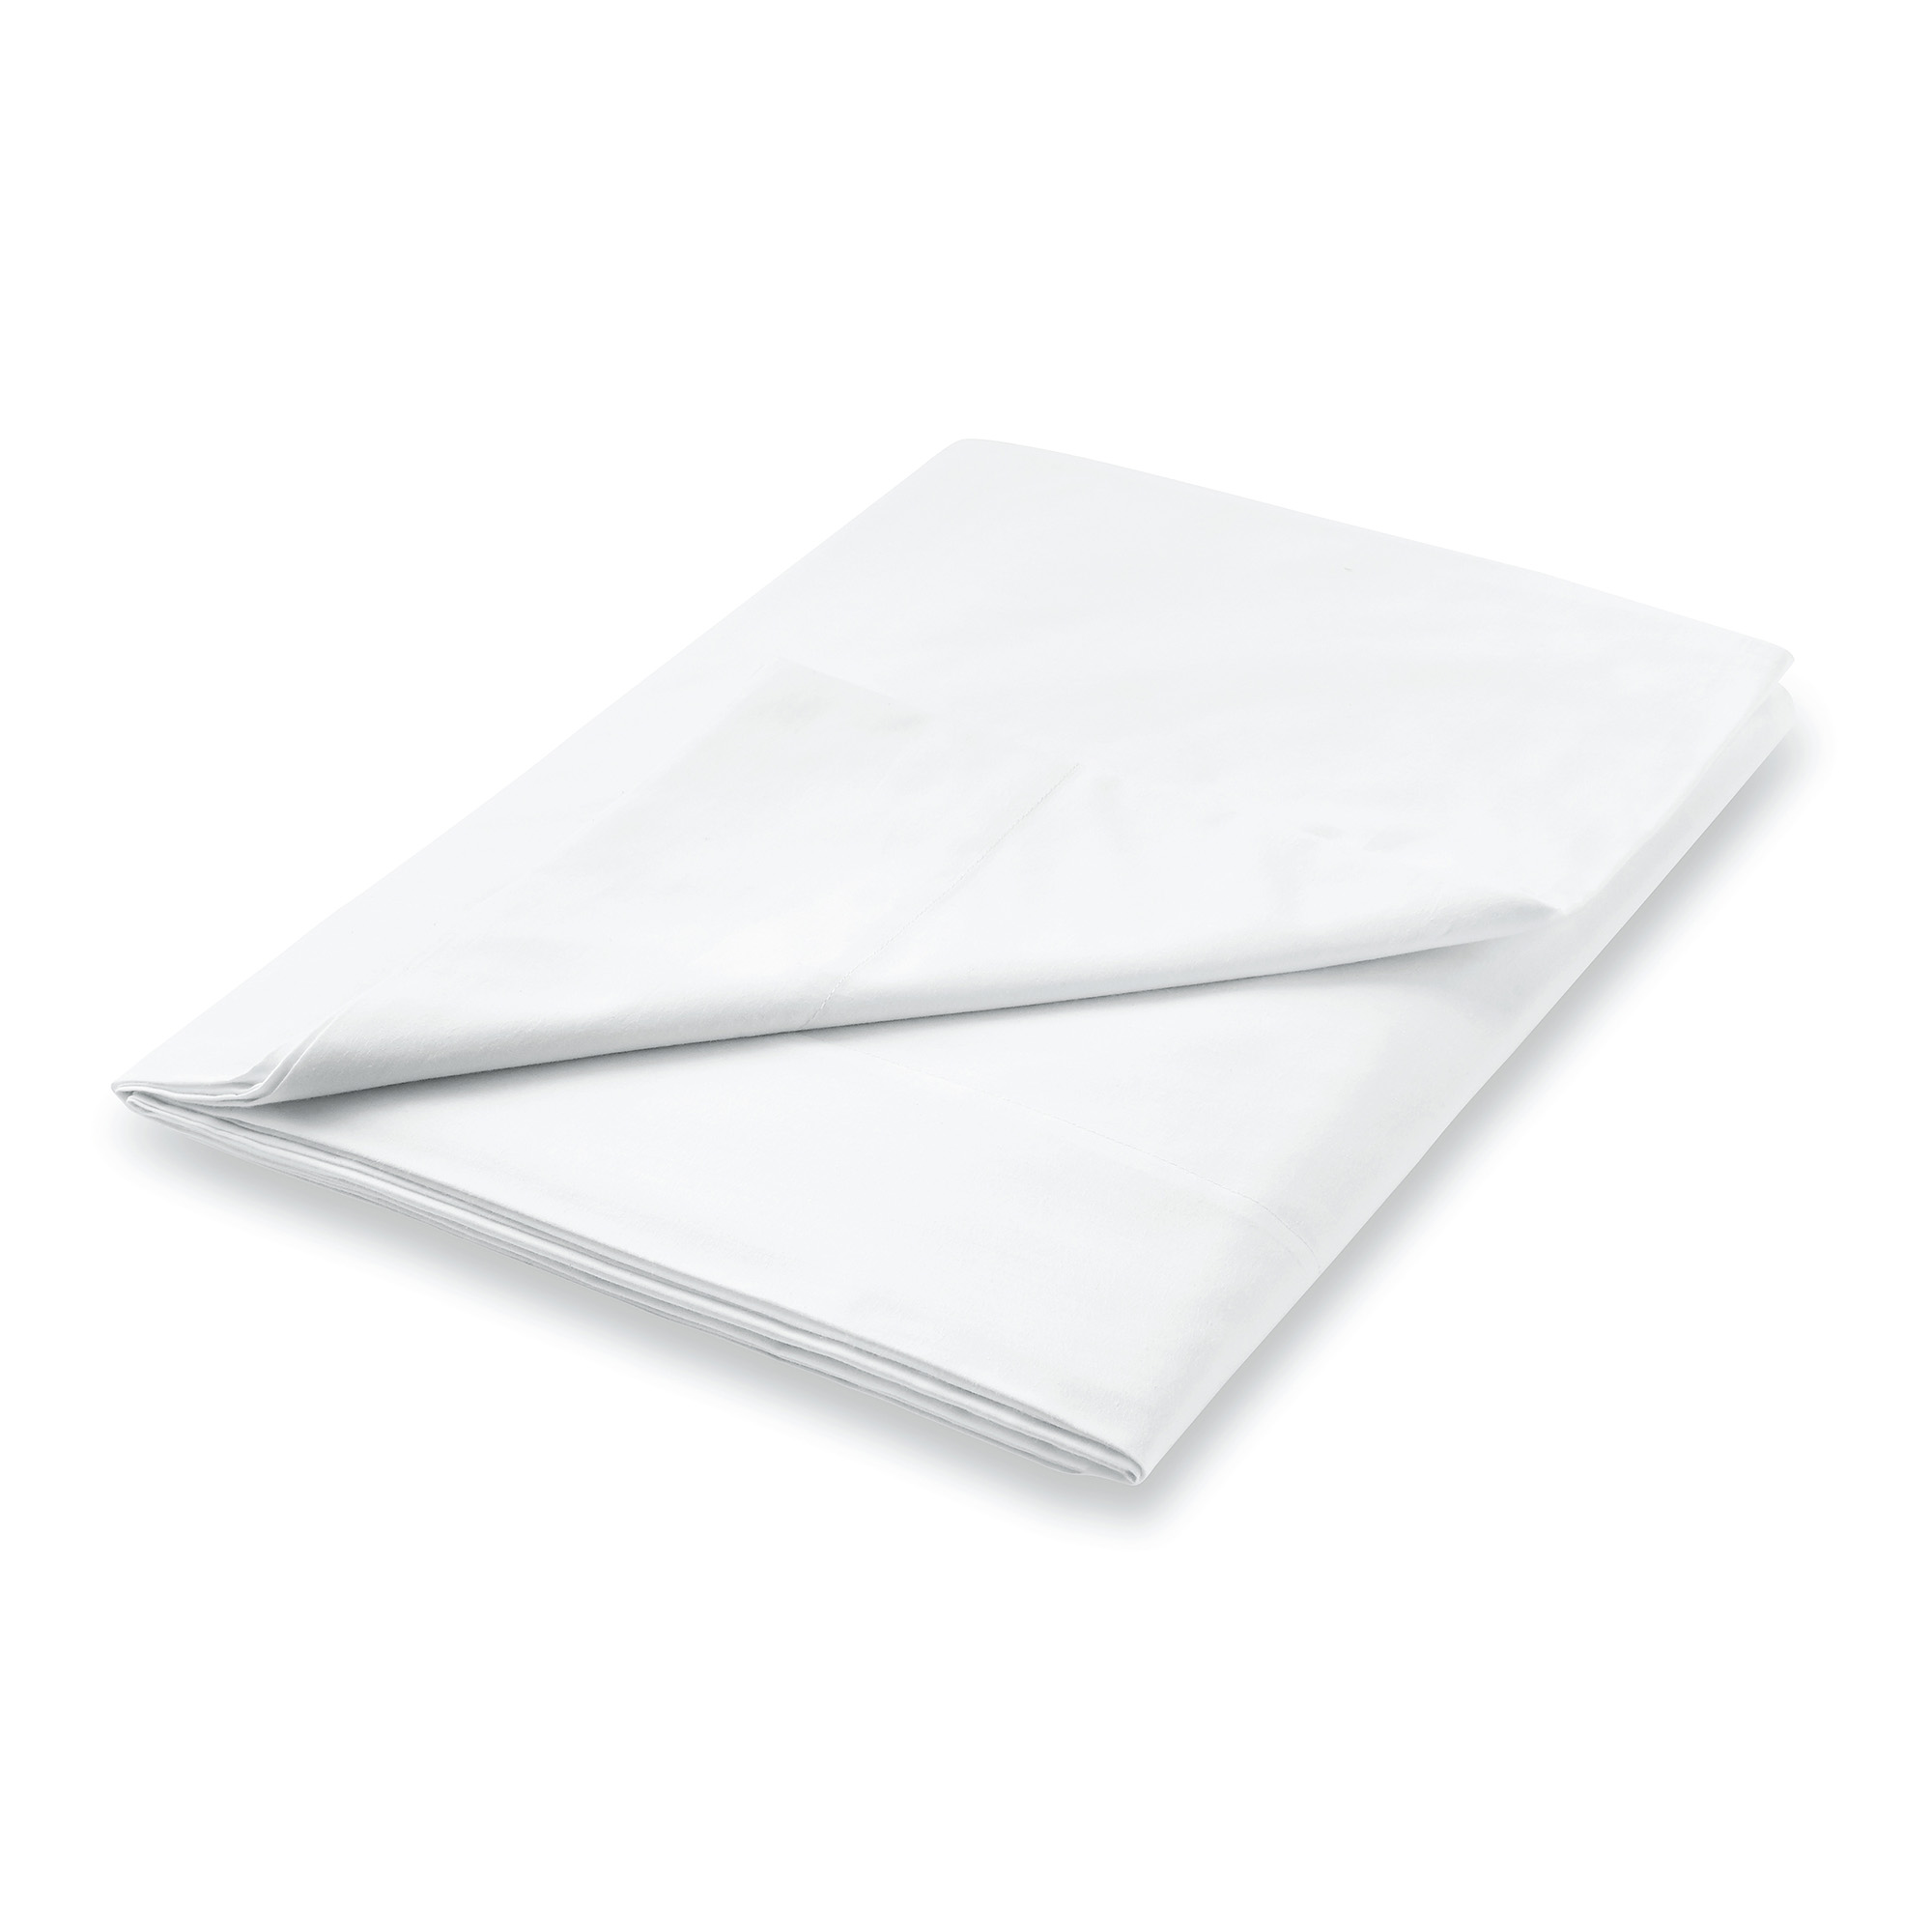 PLAIN FLAT WHITE DOUBLE